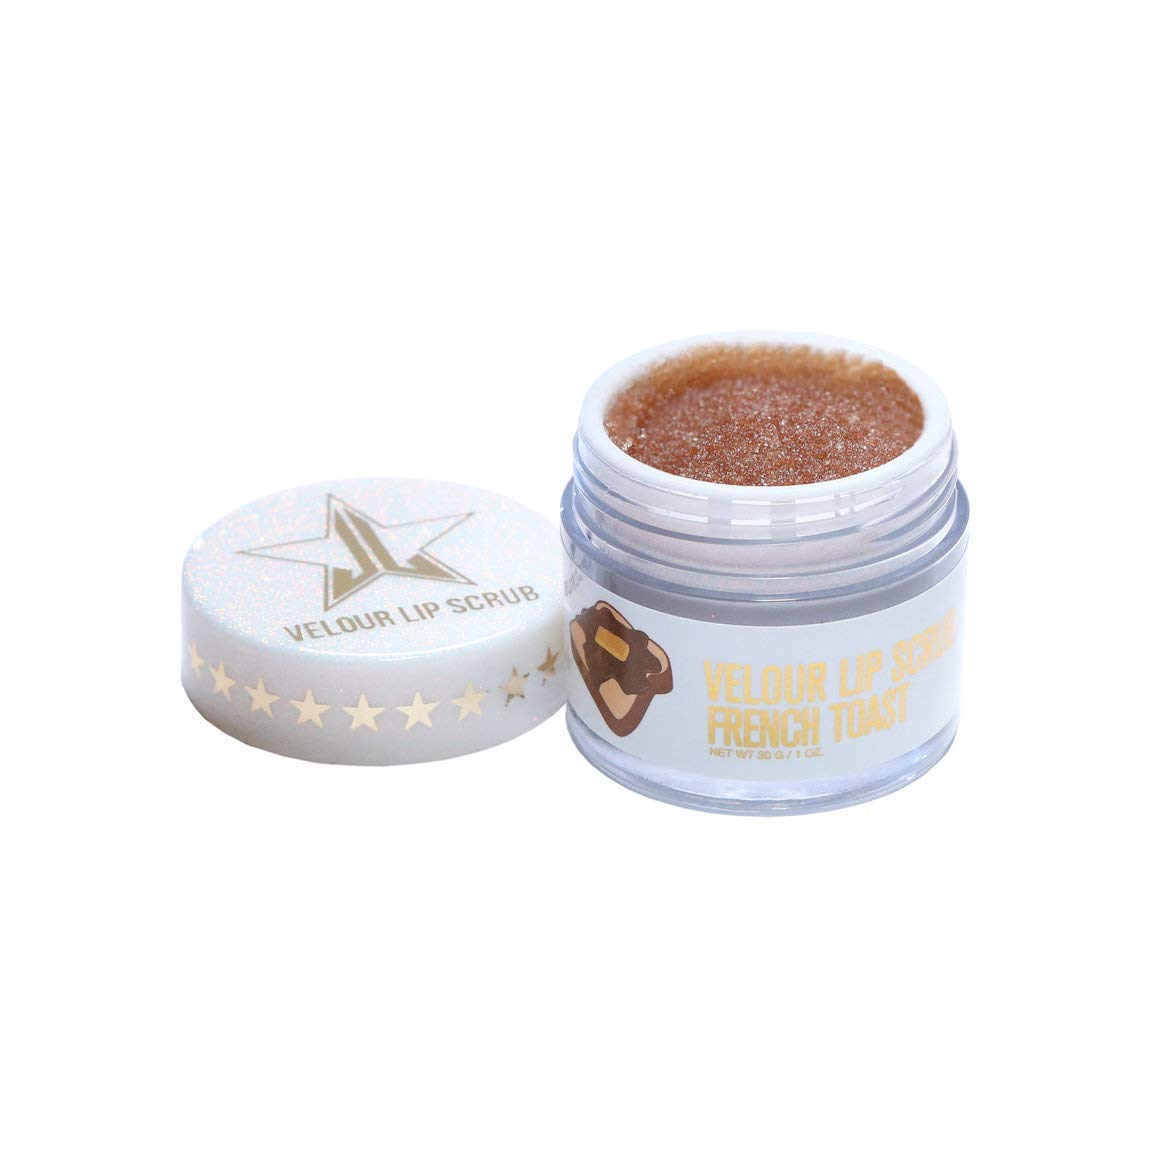 Jeffree Star Cosmetics Velour Lip Scrub, Limited Edition Holiday 2018, French Toast by Jeffree Star Cosmetics